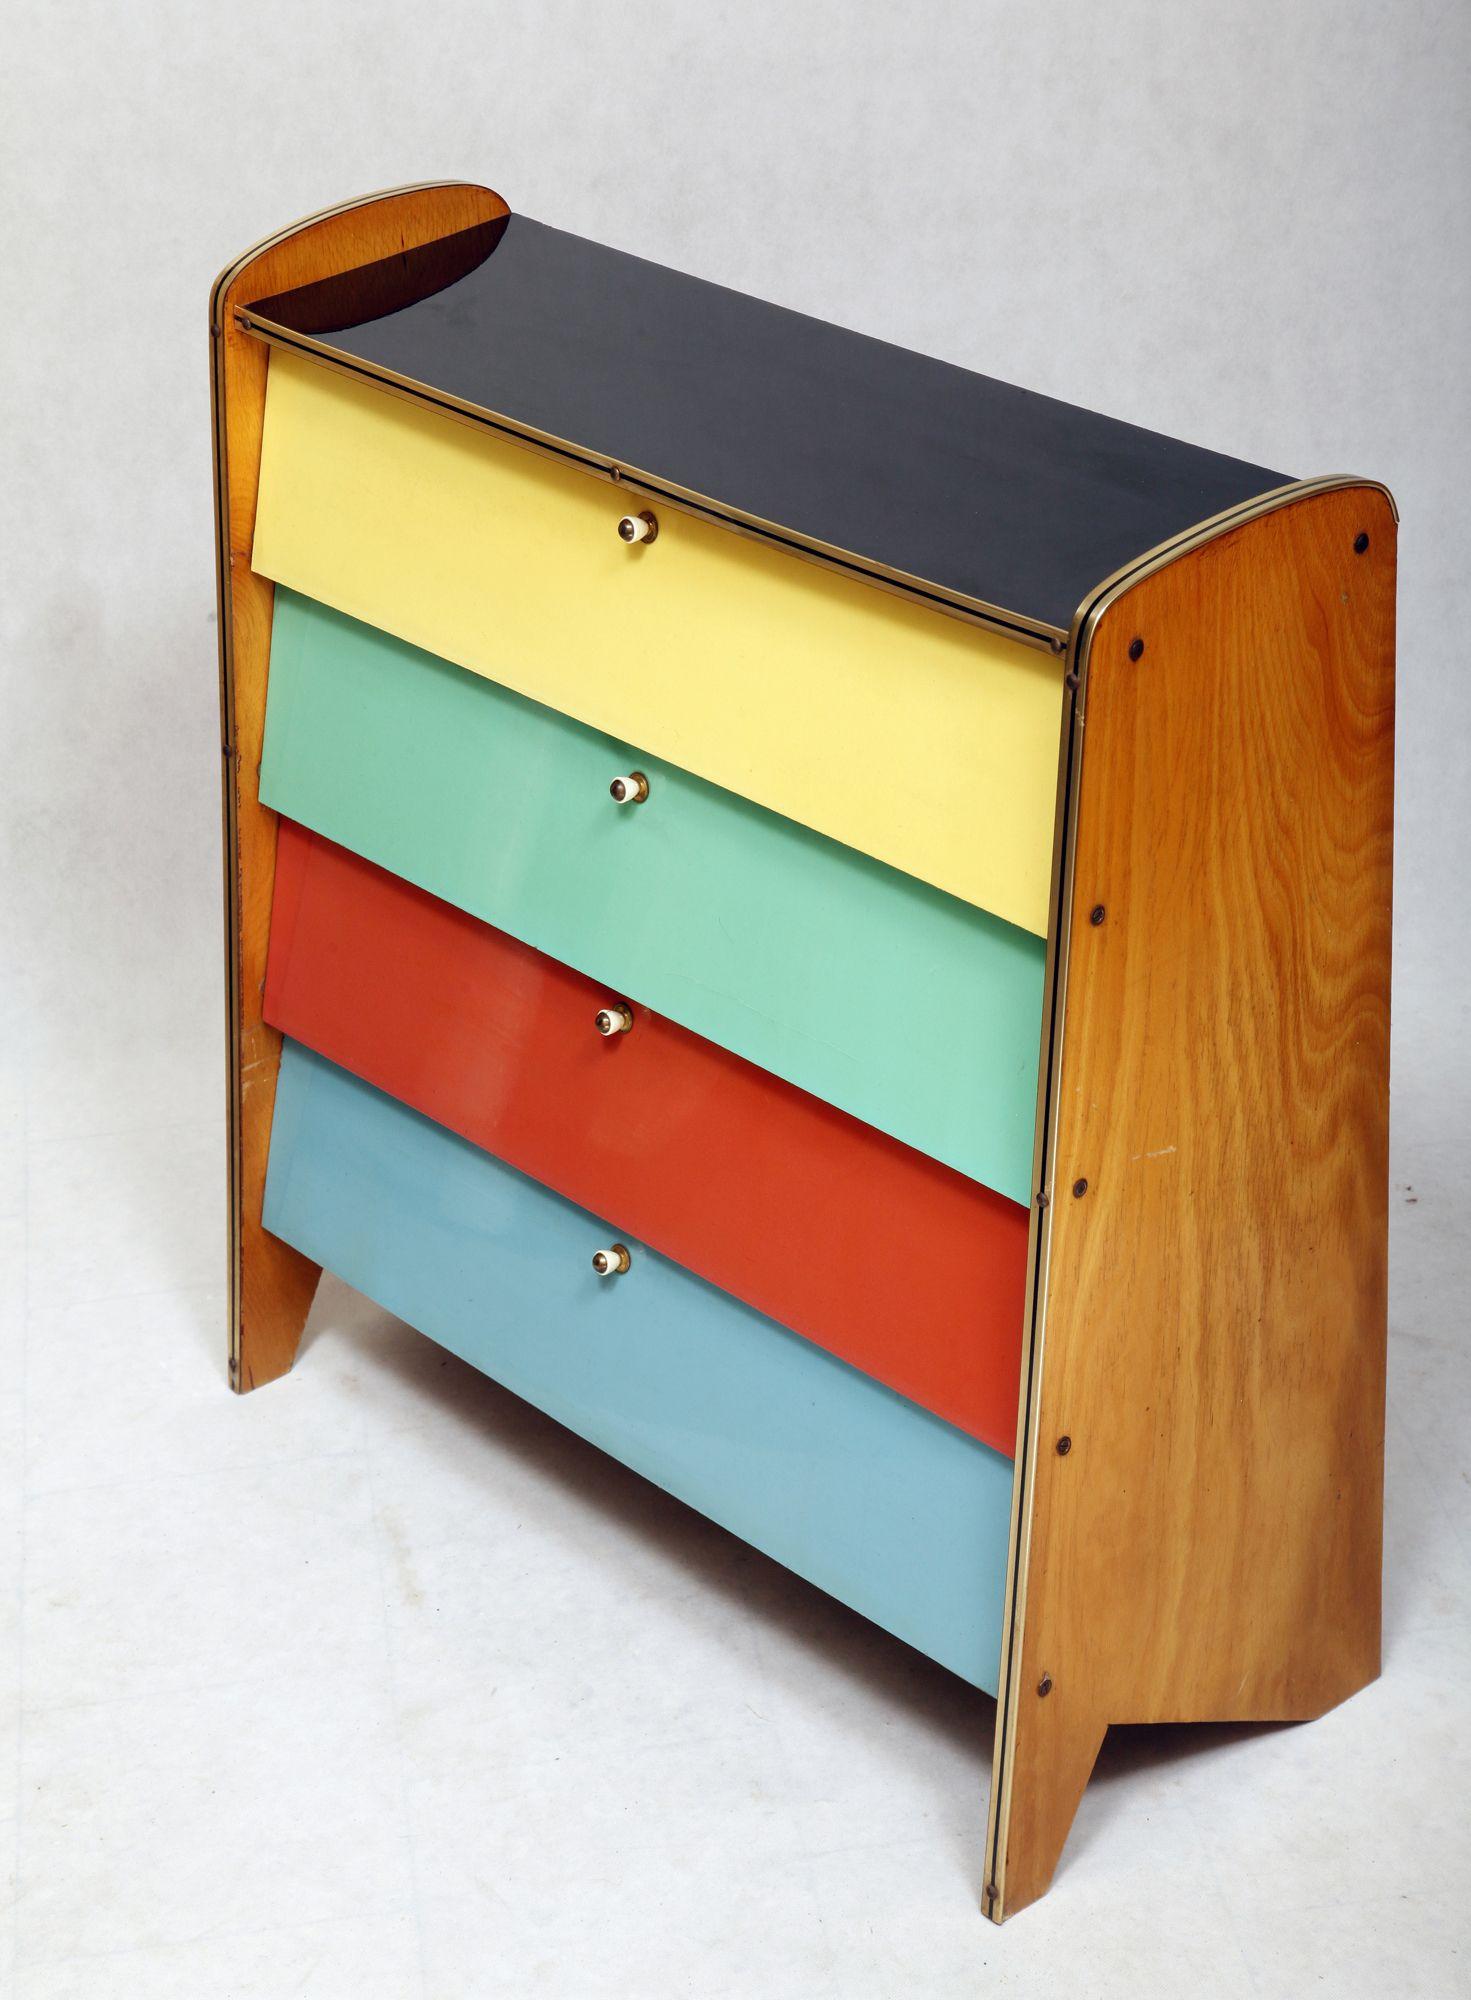 Niemala Szafka Na Buty Lata 60 70 Decor Furniture Home Decor